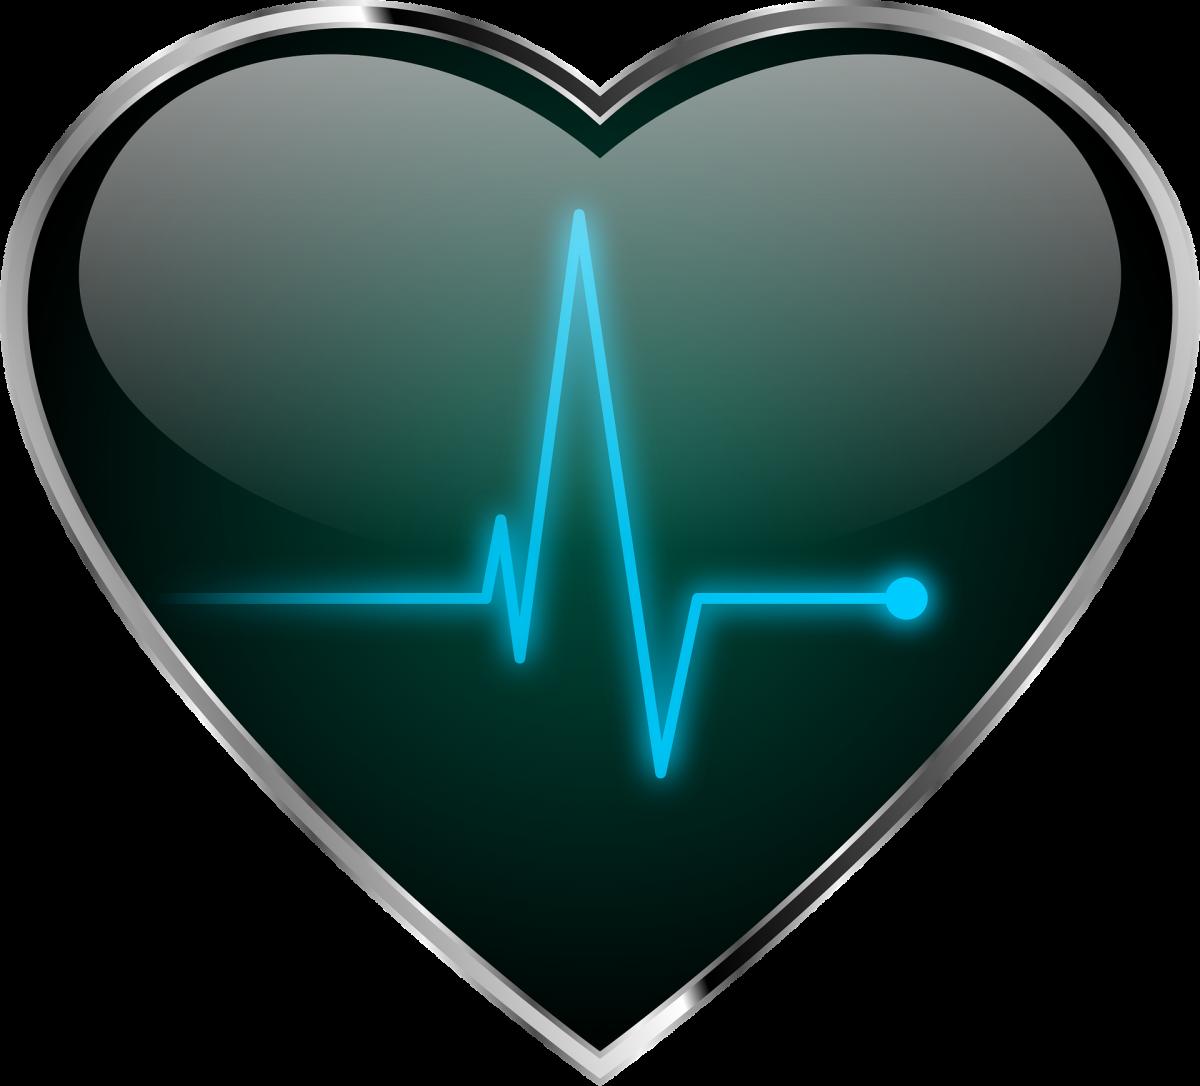 Cardio - Do I need it?